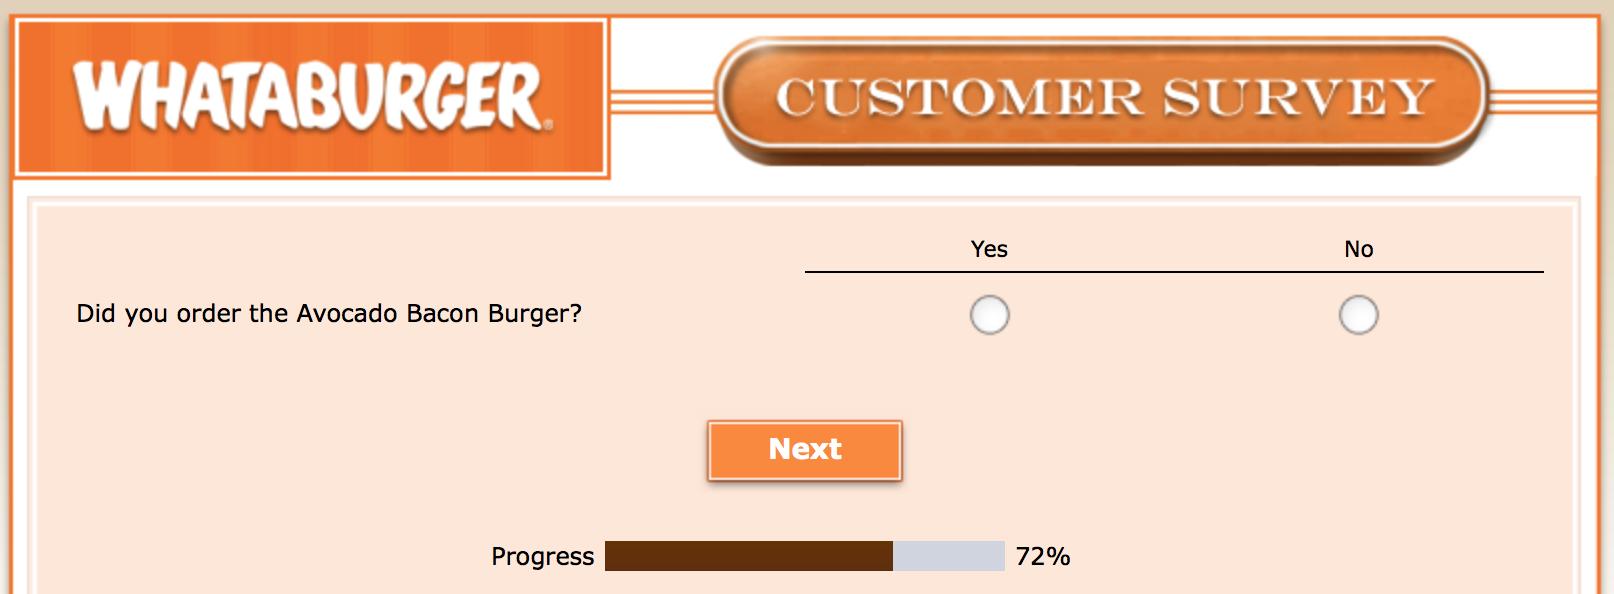 Whataburger Survey 22